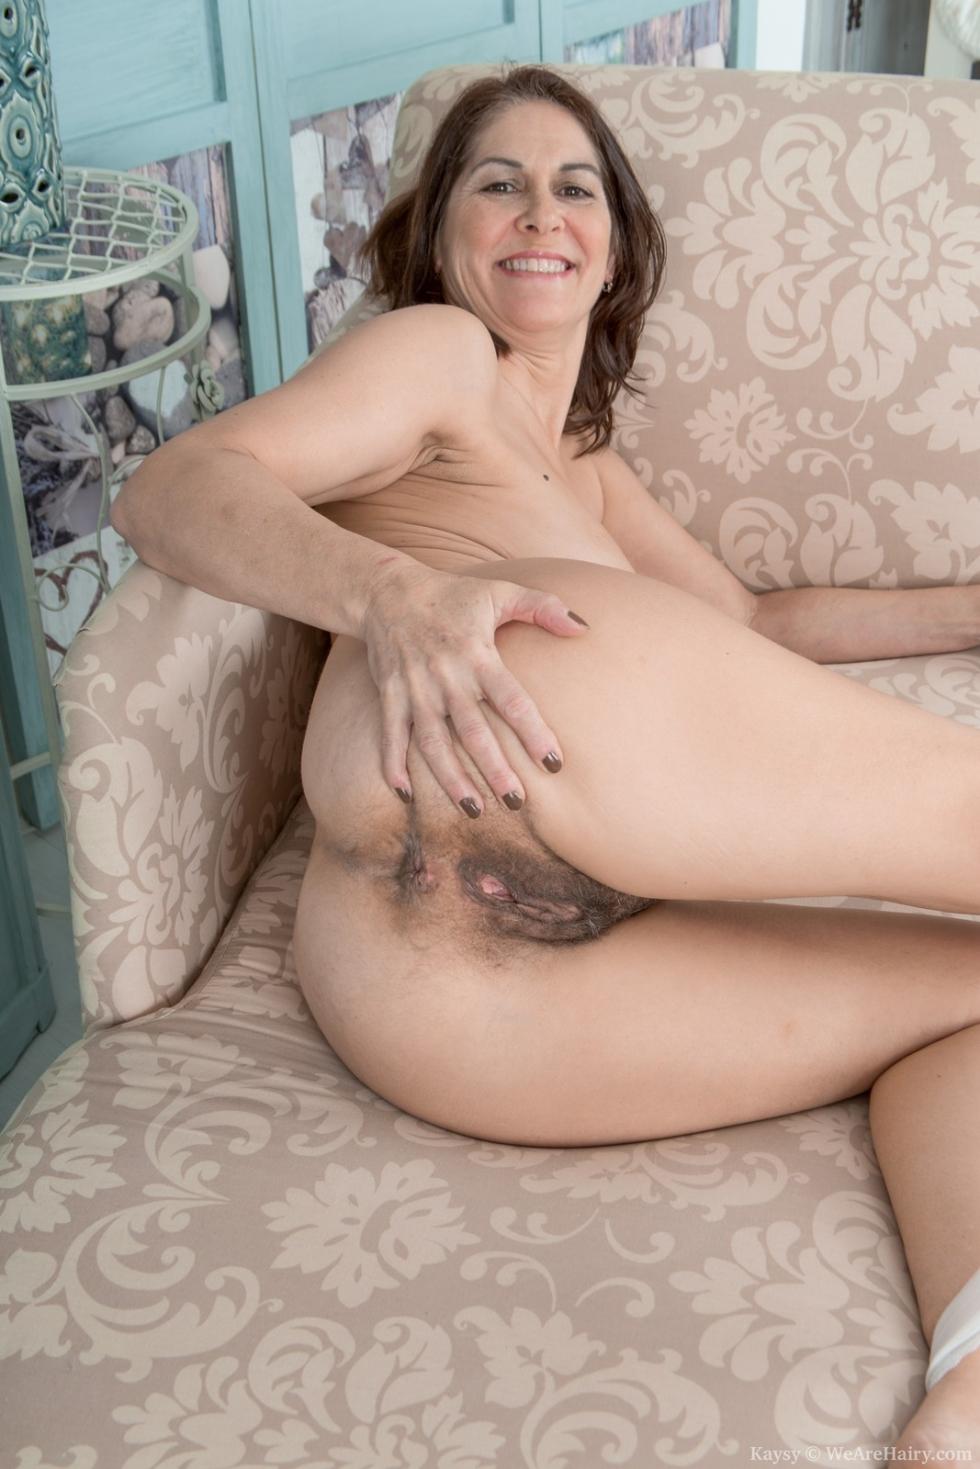 Nude mature model gallery useful topic